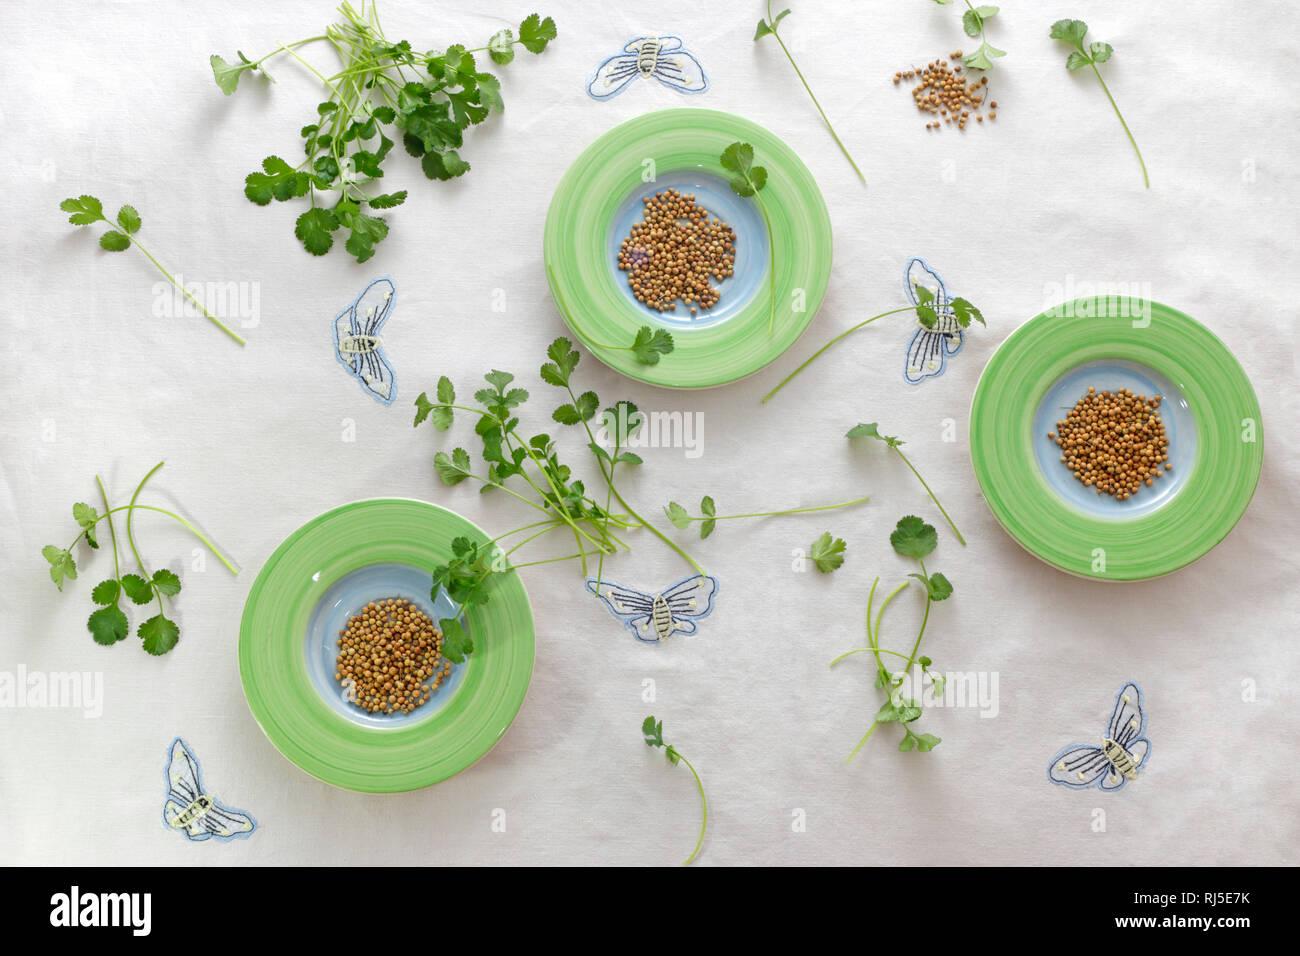 Koriandersamen und Blattkoriander - Stock Image